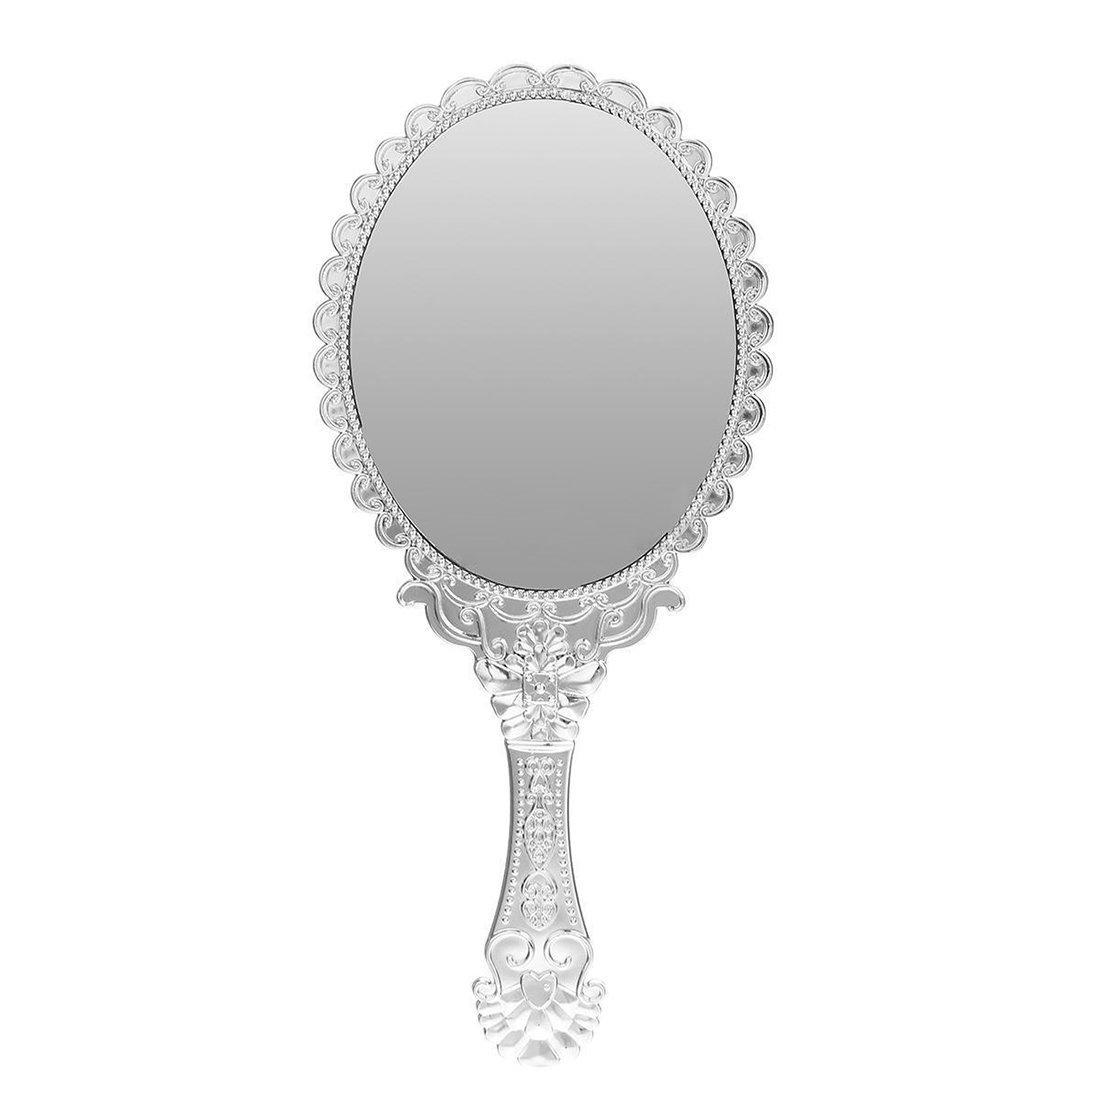 TOOGOO(R) Ladies Vintage Repousse Floral Hand Held Oval Mirror Makeup Dresser SHOMAGT27206